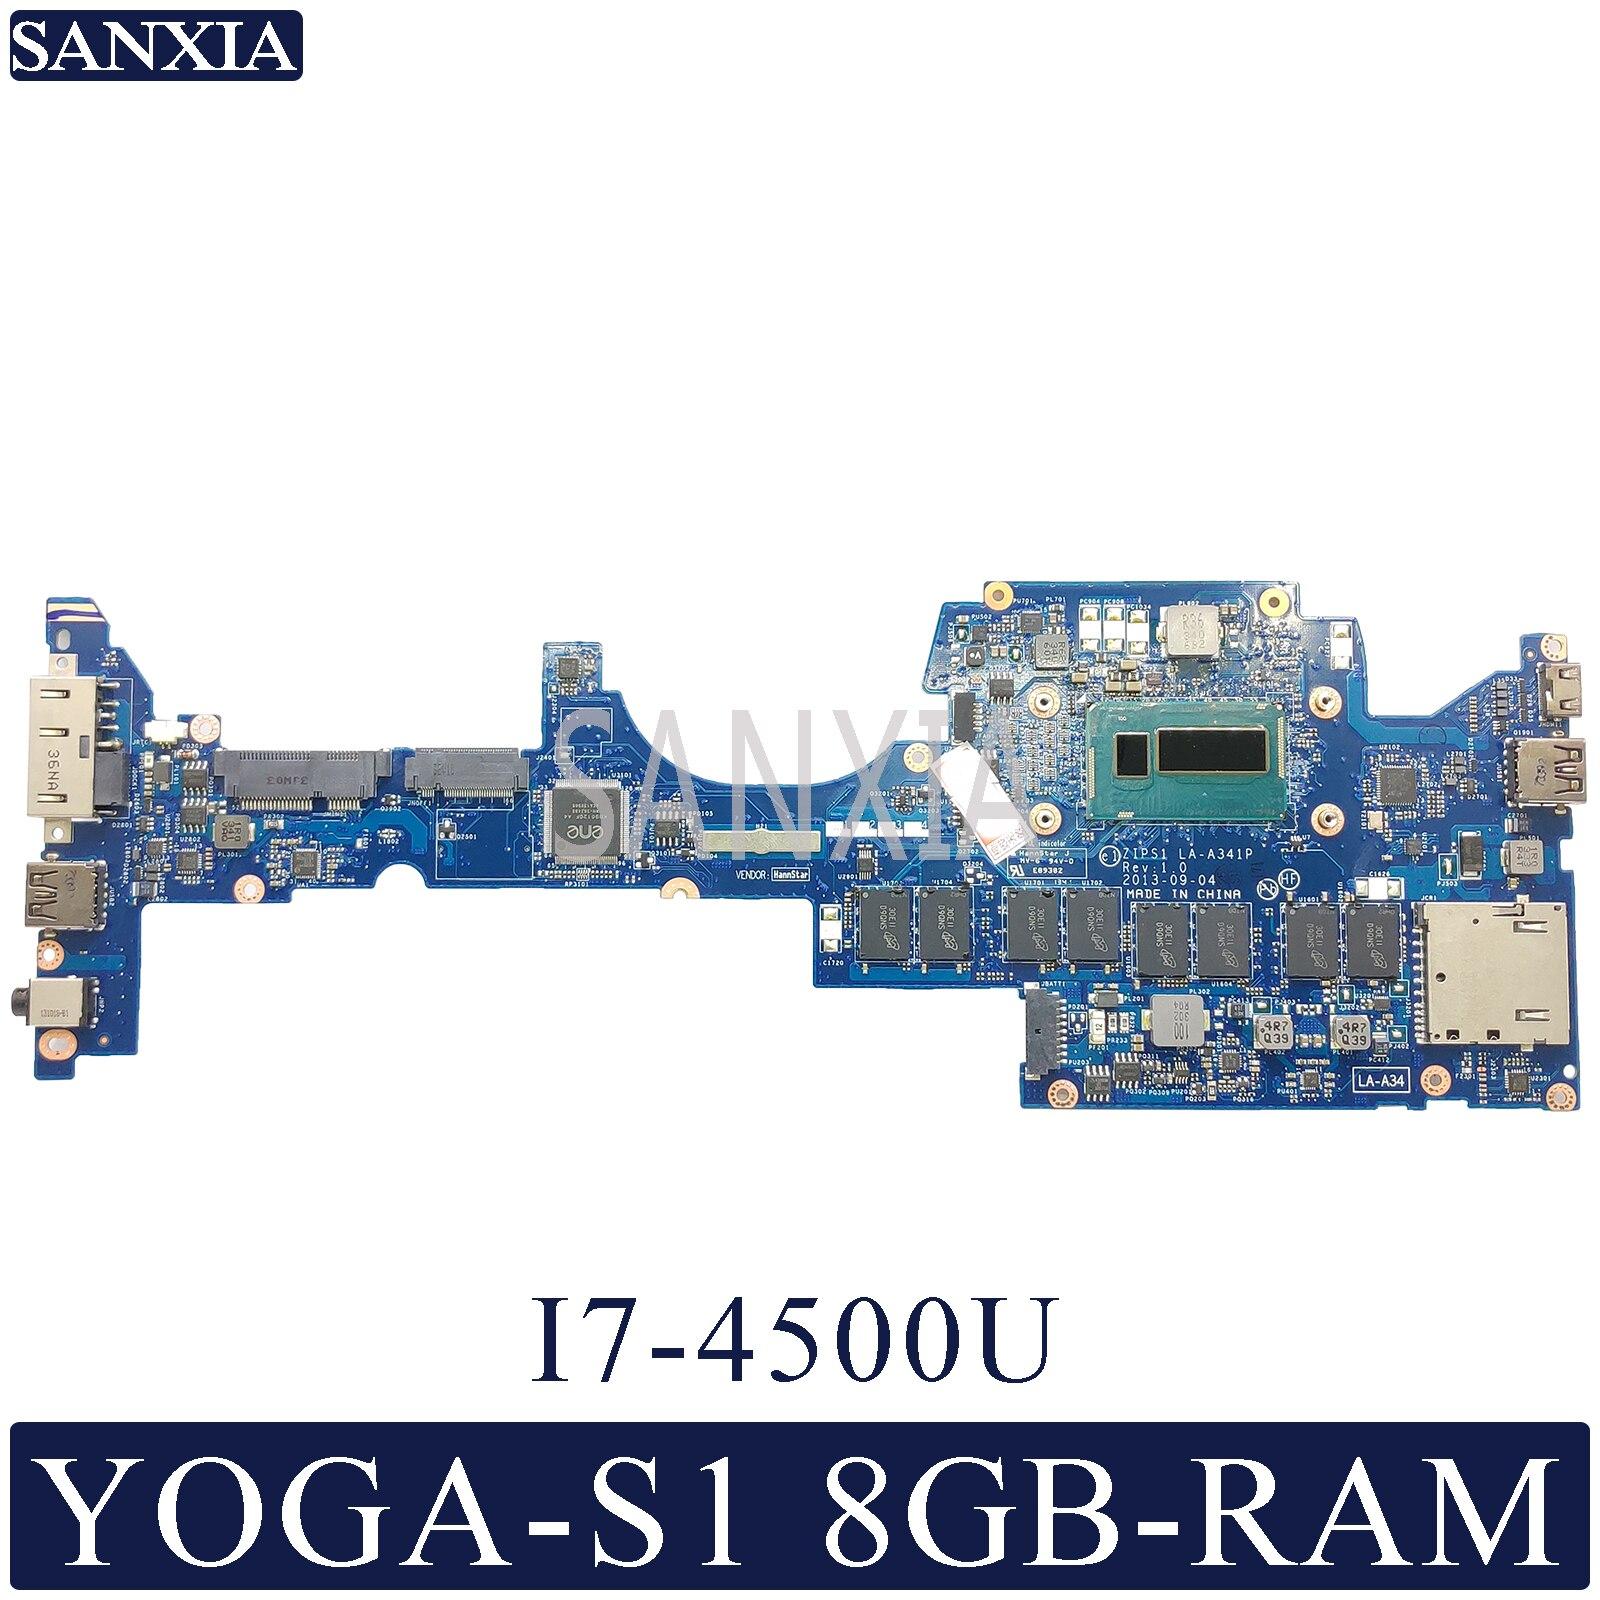 KEFU LA-A341P Laptop motherboard para Lenovo ThinkPad YOGA S1 mainboard original 8GB-RAM I7-4500U